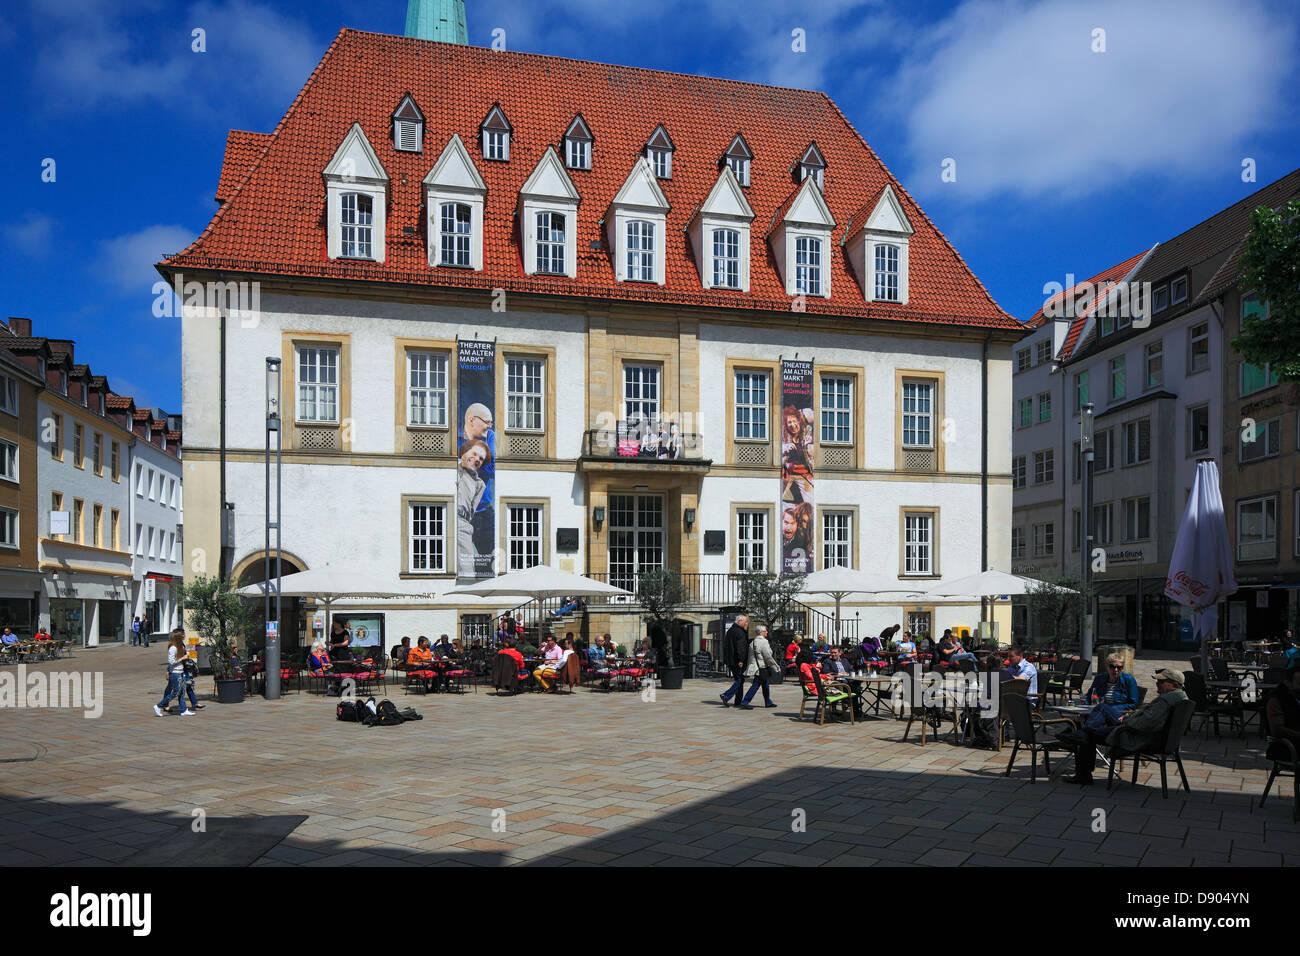 alter markt mit theater am alten markt in bielefeld teutoburger stock photo royalty free. Black Bedroom Furniture Sets. Home Design Ideas